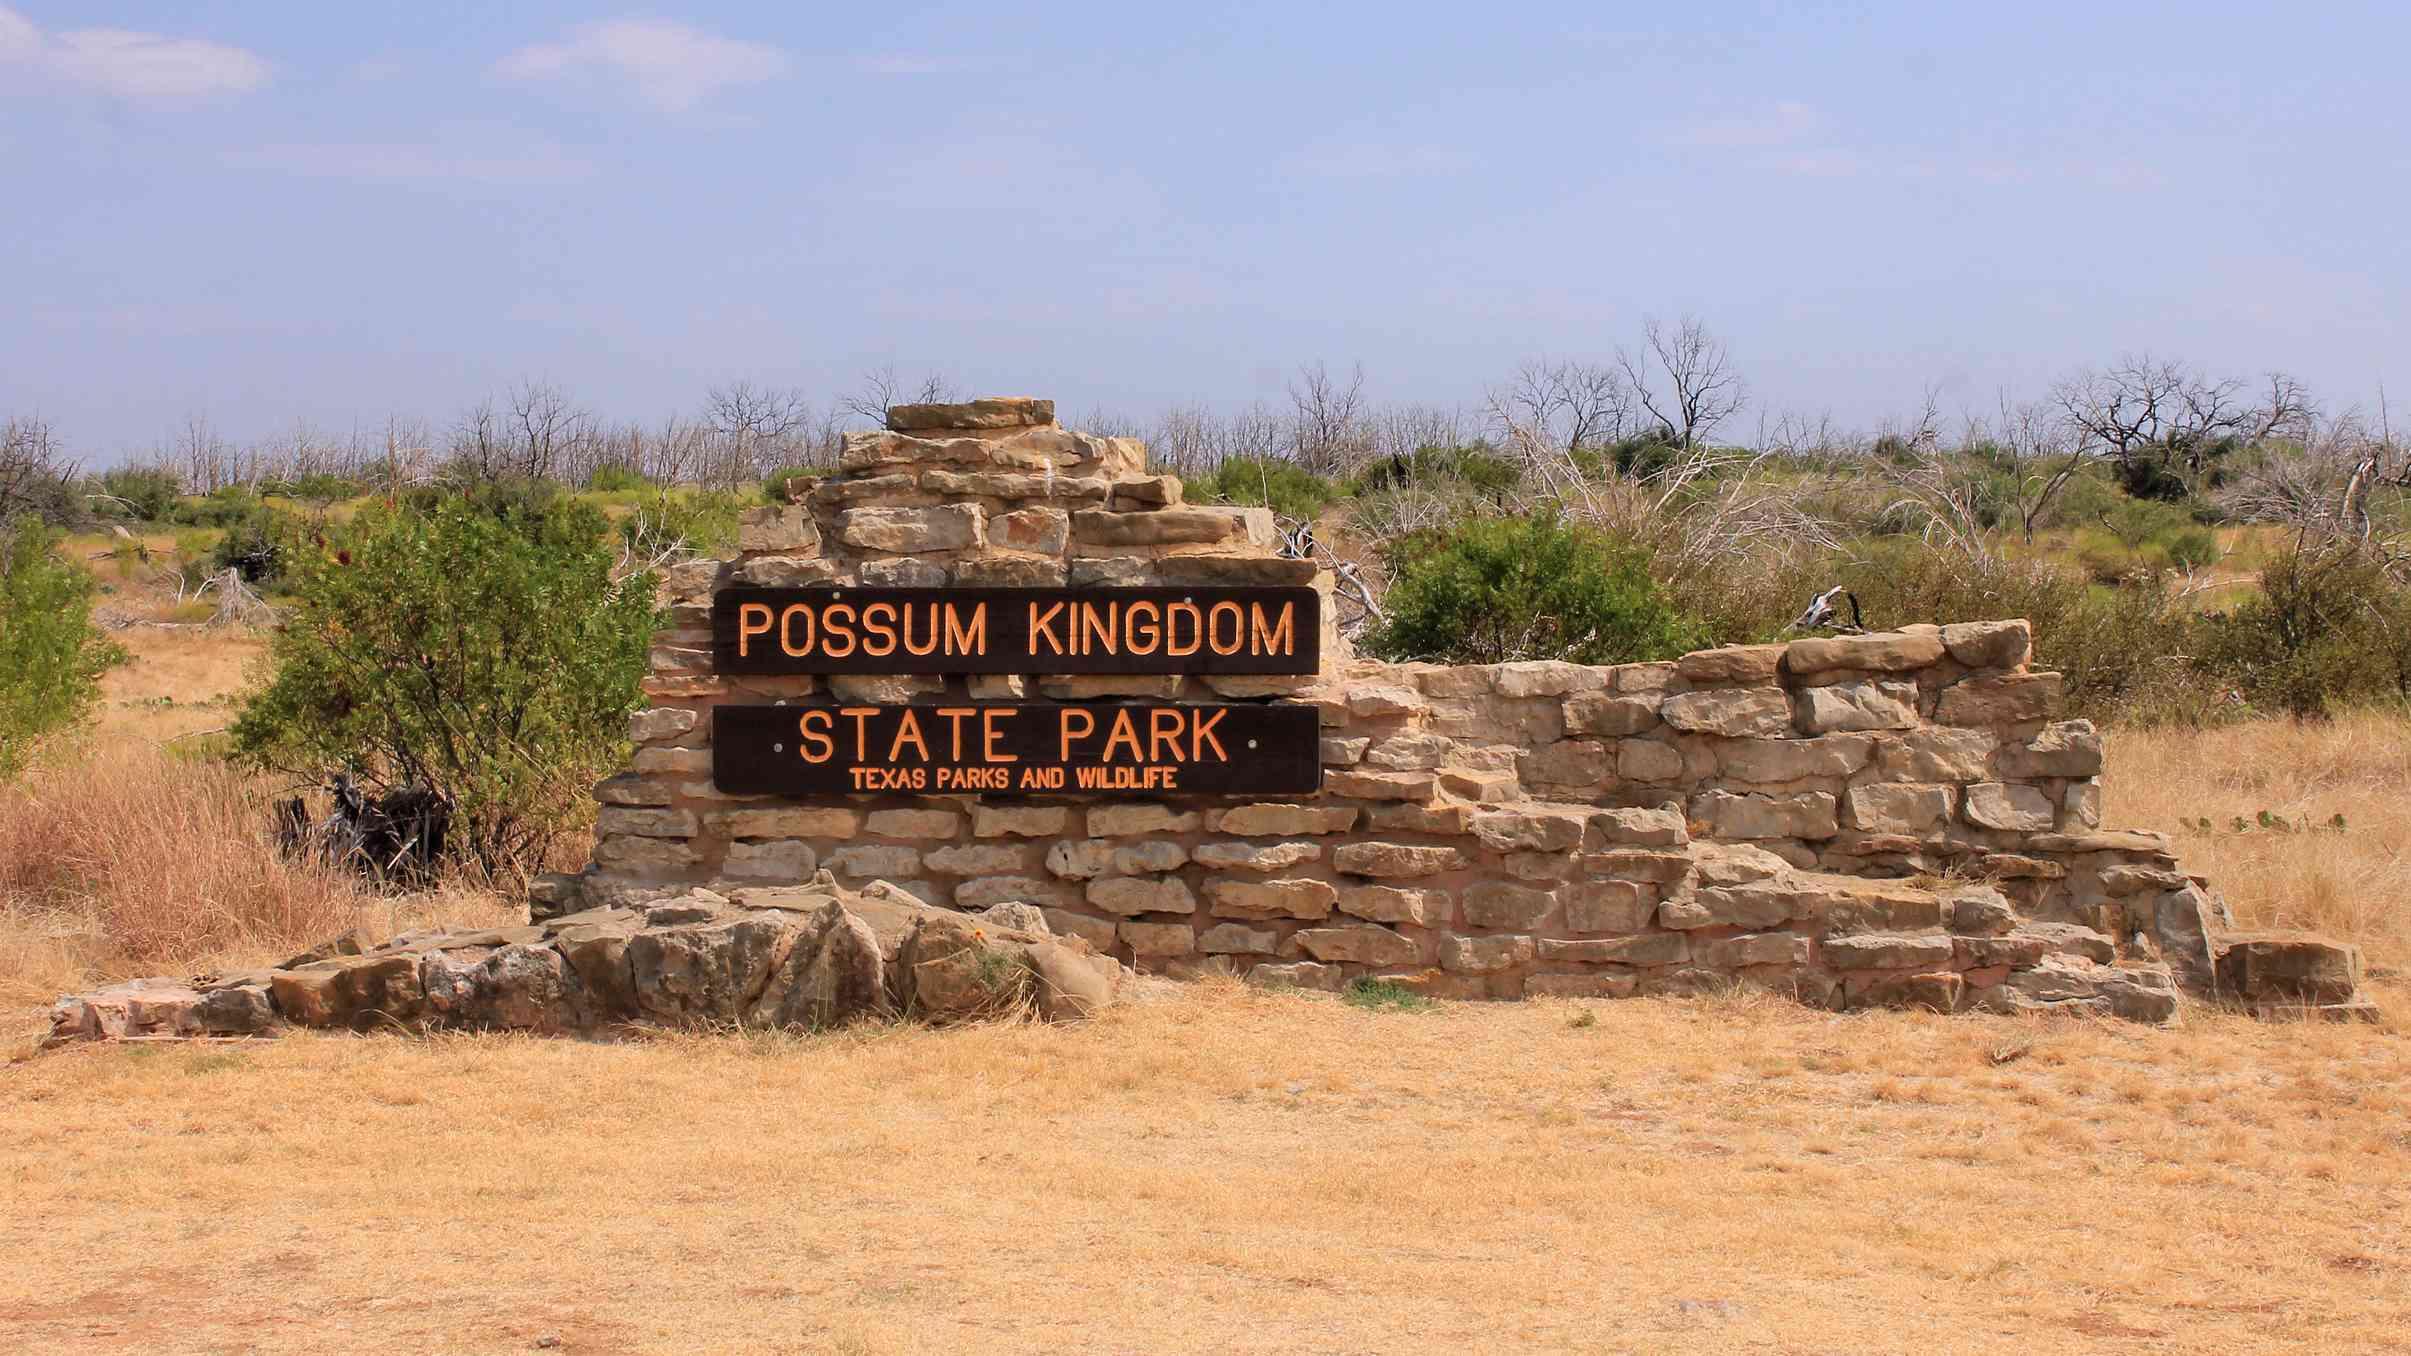 Entrance sign to Possum Kingdom State Park